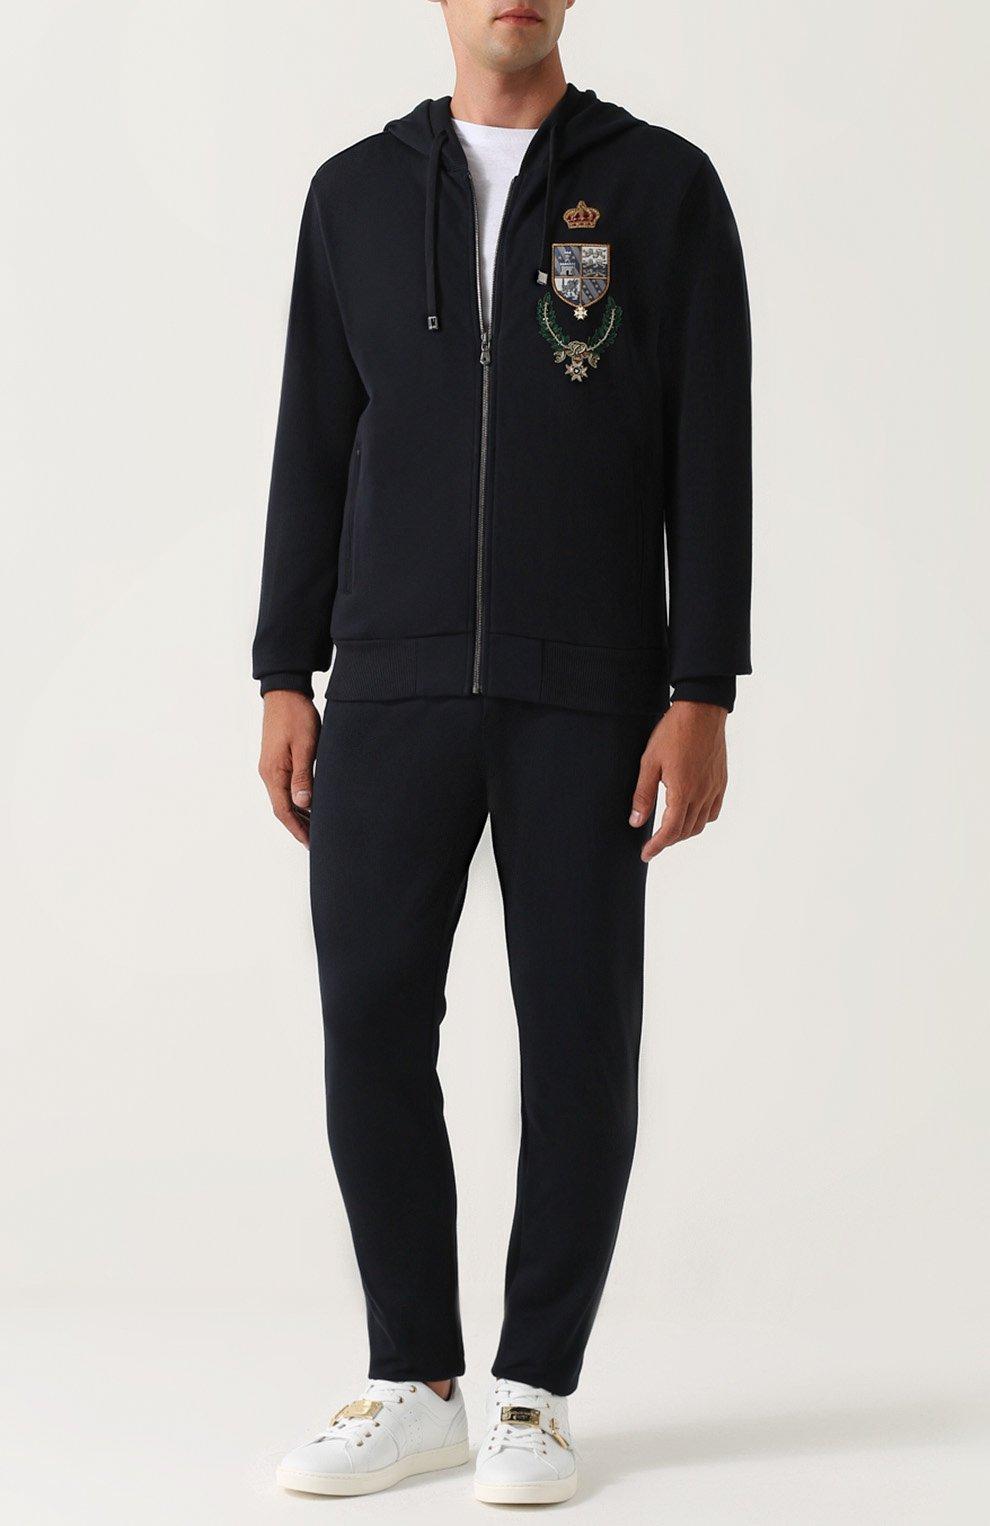 Кардиган на молнии с капюшоном и вышивкой Dolce & Gabbana синий | Фото №2